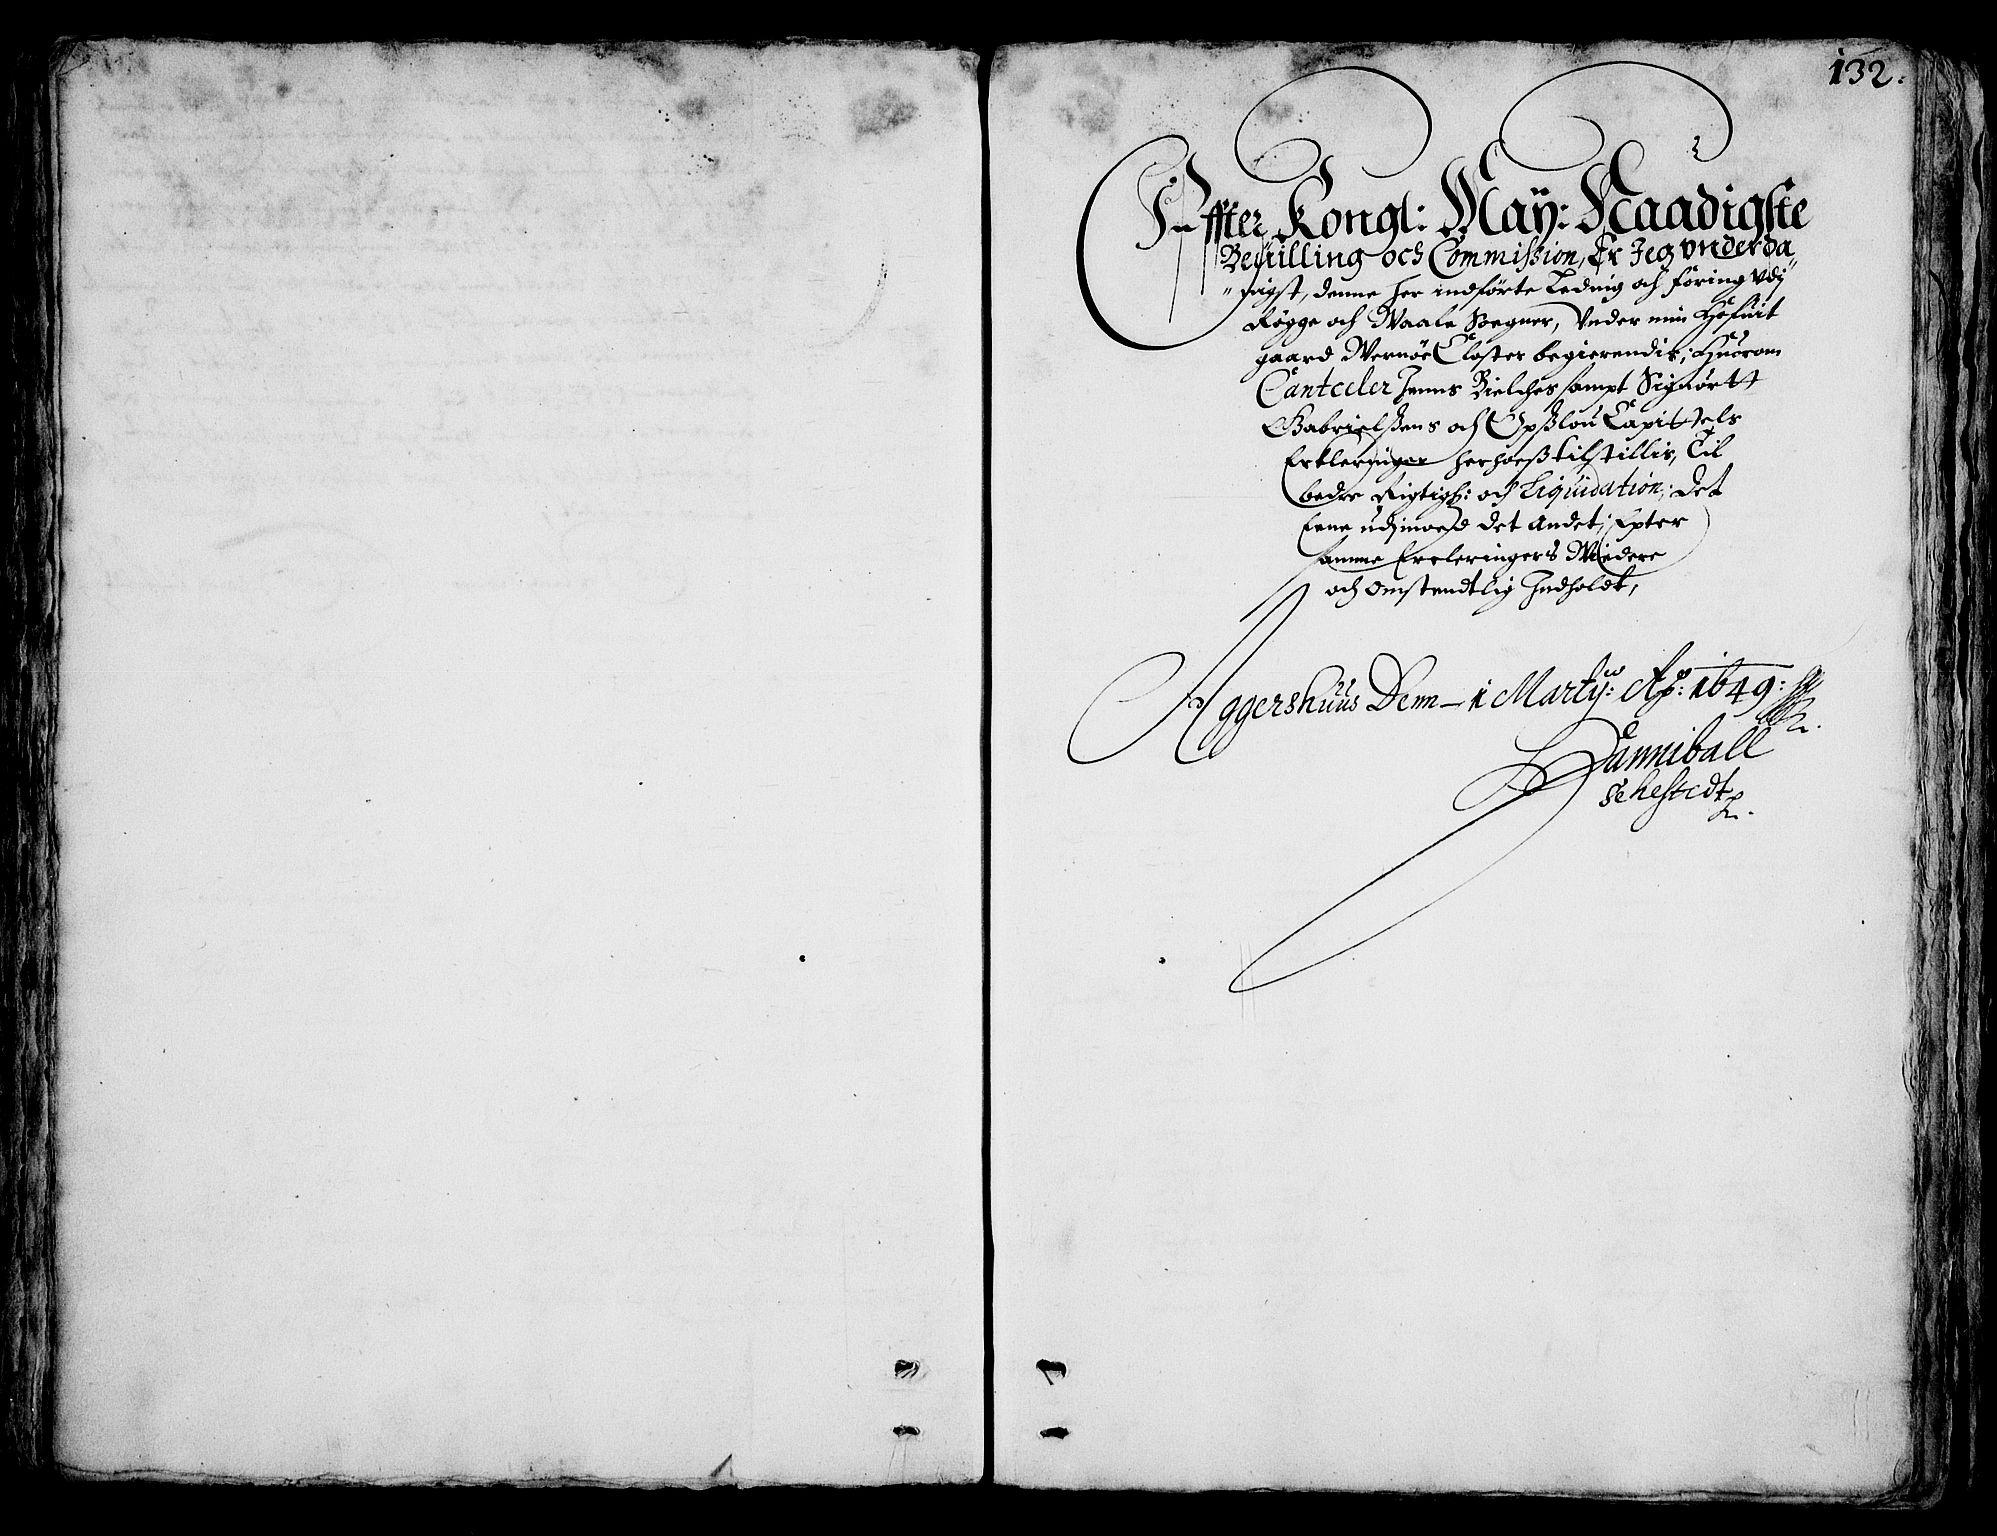 RA, Rentekammeret inntil 1814, Realistisk ordnet avdeling, On/L0001: Statens gods, 1651, s. 131b-132a